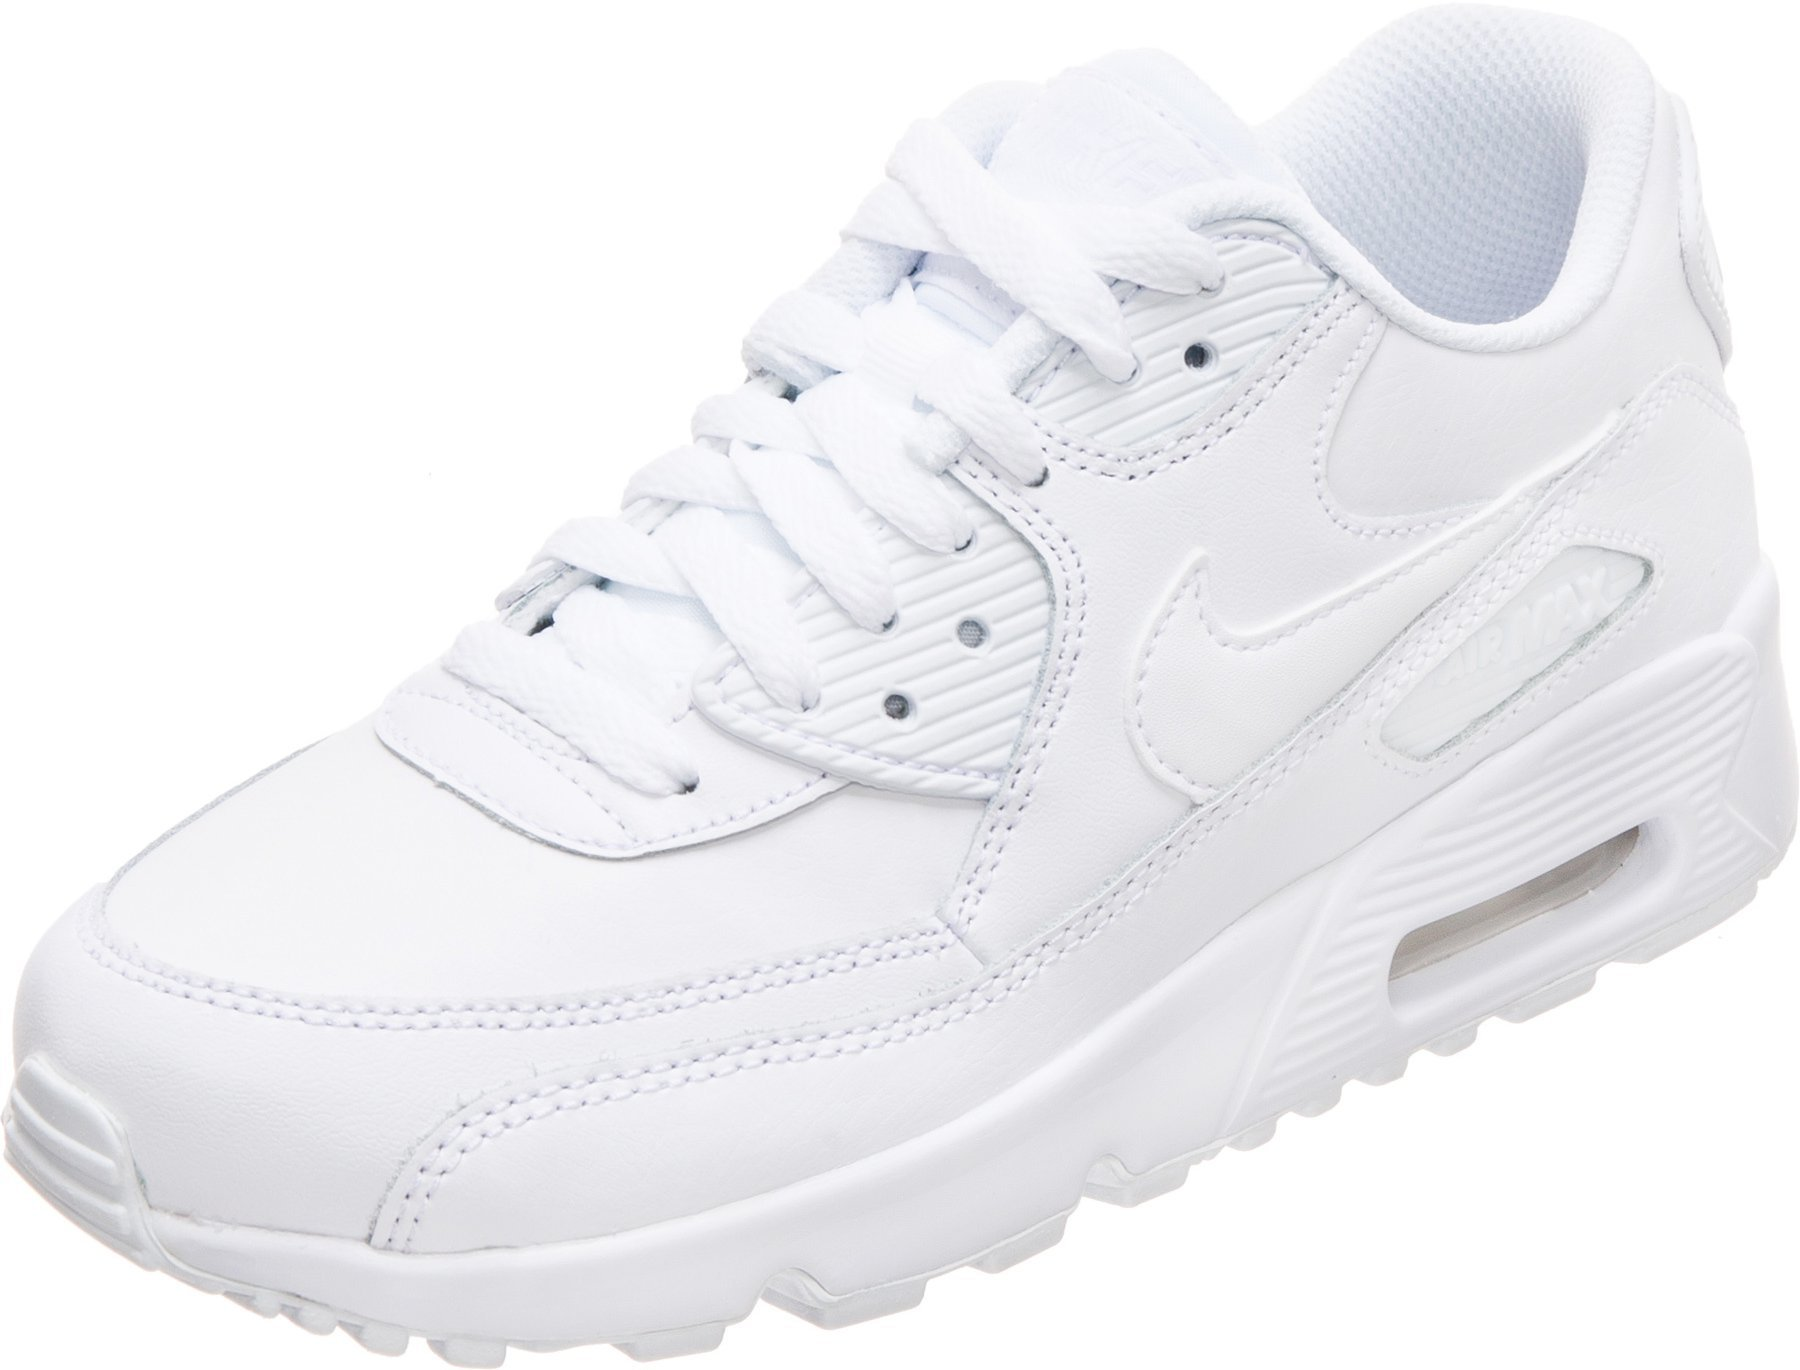 Nike Air Max 90 Ltr Gs Jr 833412 001 shoes black in 2019